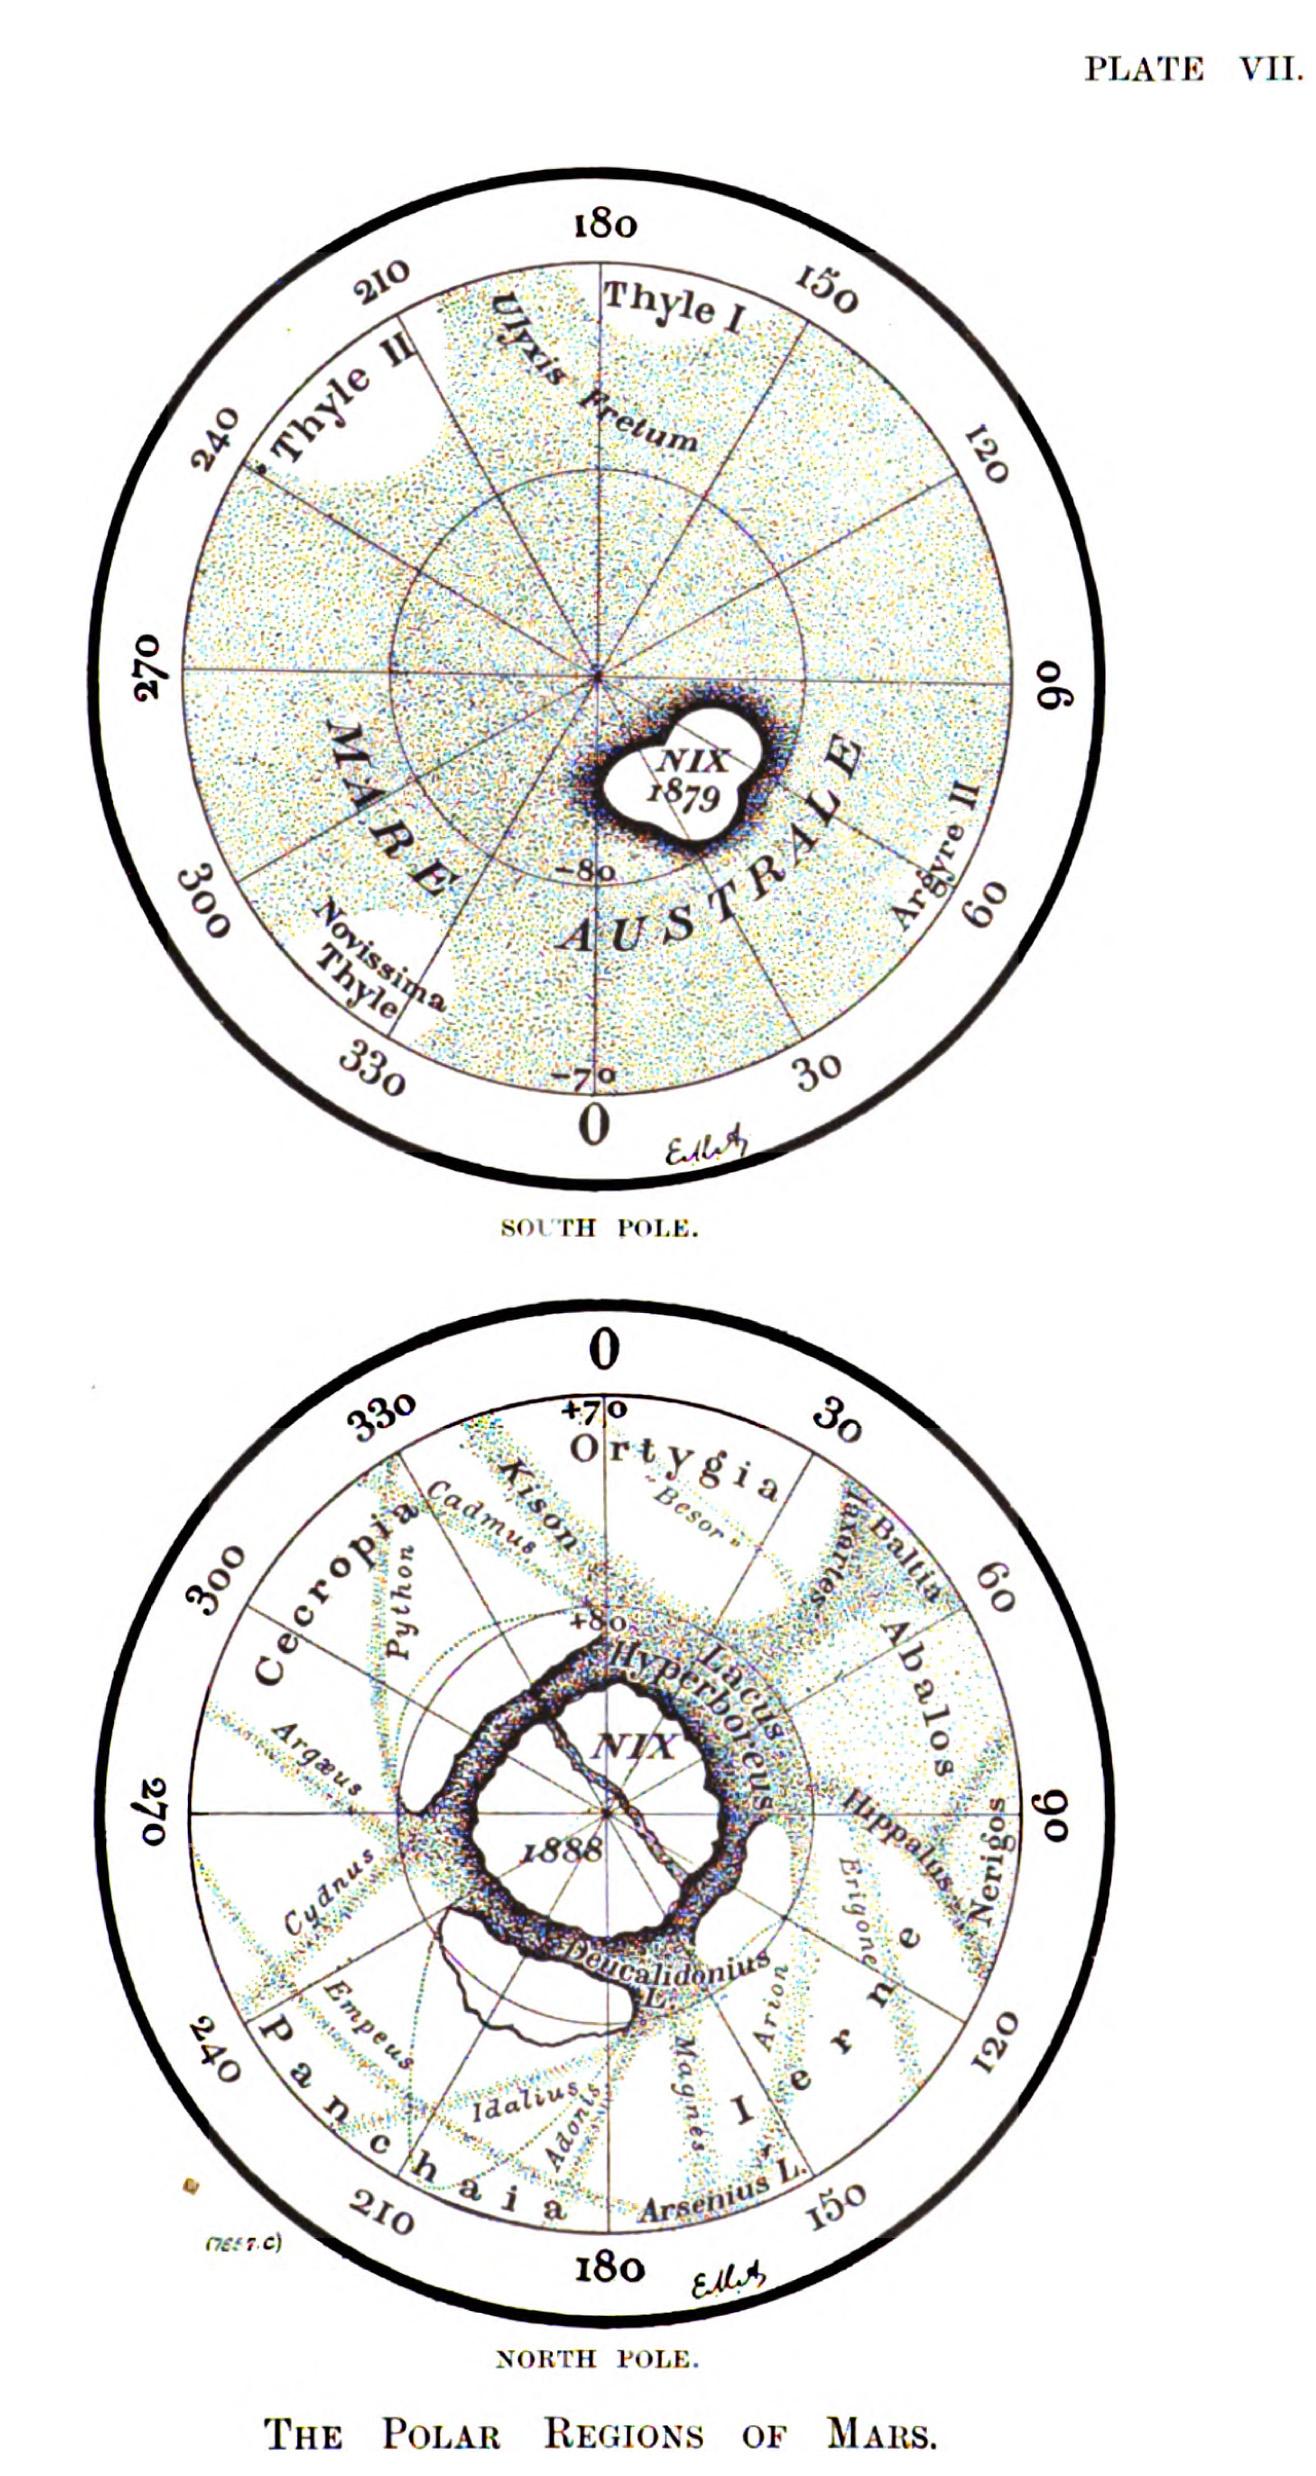 Antoniadi's Polar Maps of Mars 1900-1901